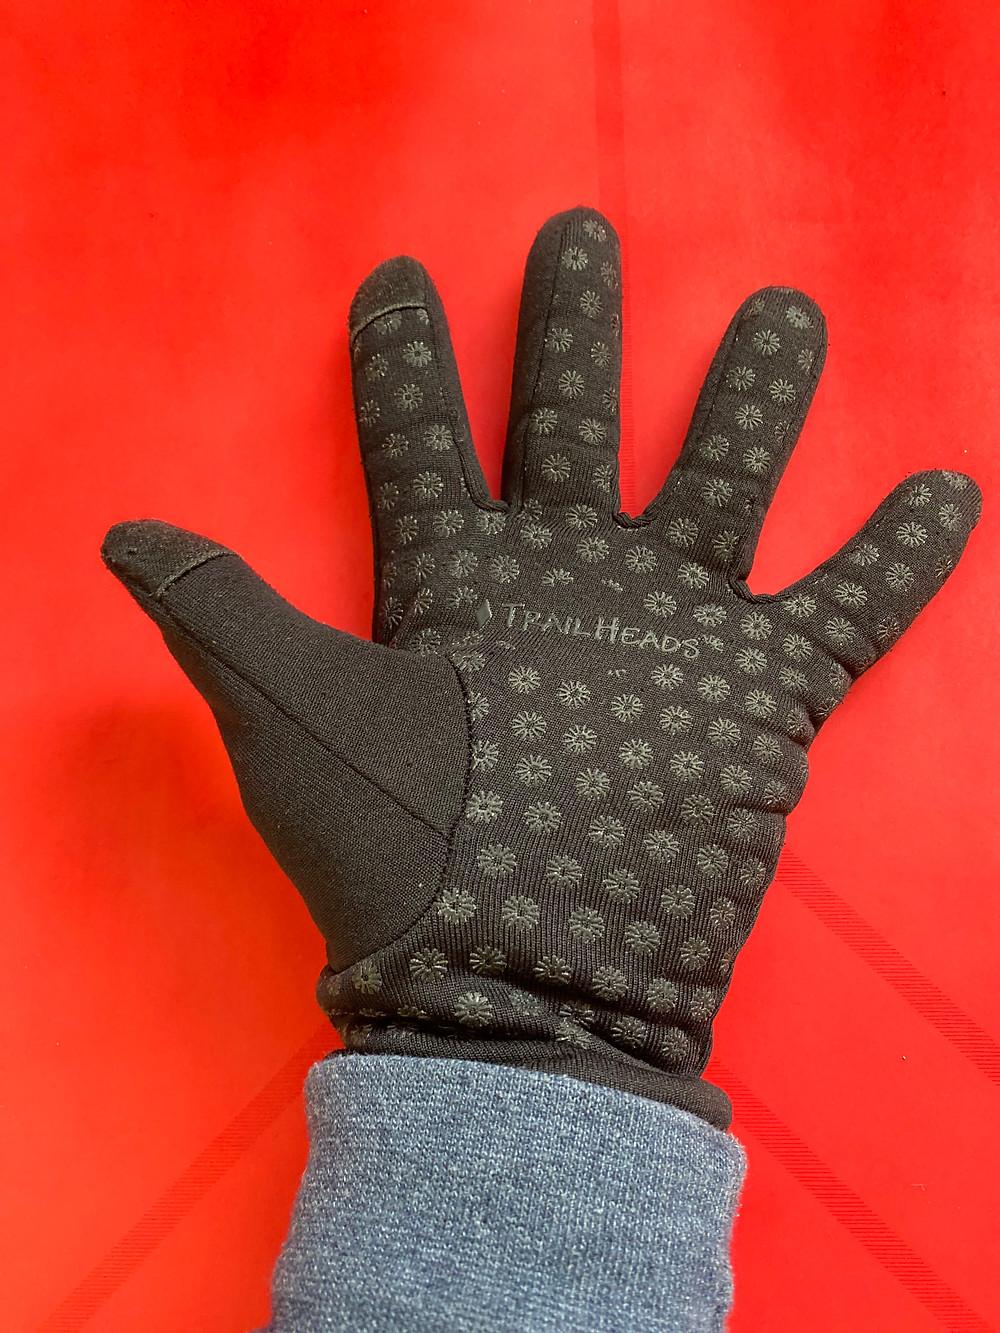 Trailheads black gloves